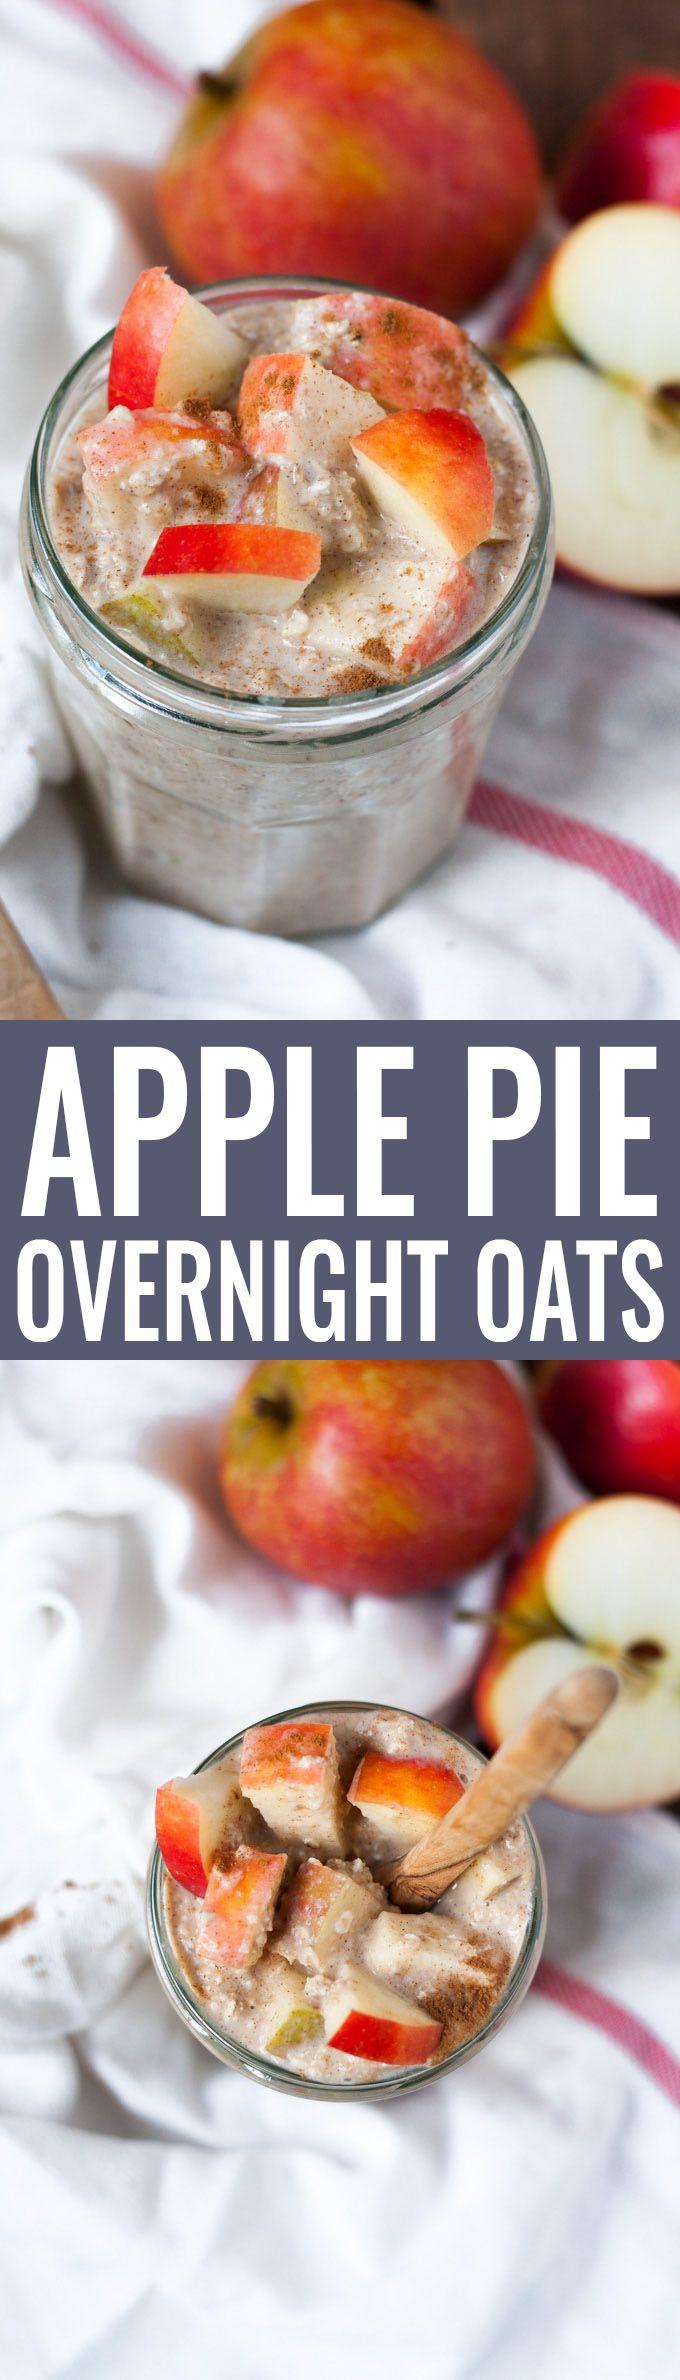 Apple Pie Overnight Oats - Wie Apfelkuchen zum Löffeln - Kochkarussell